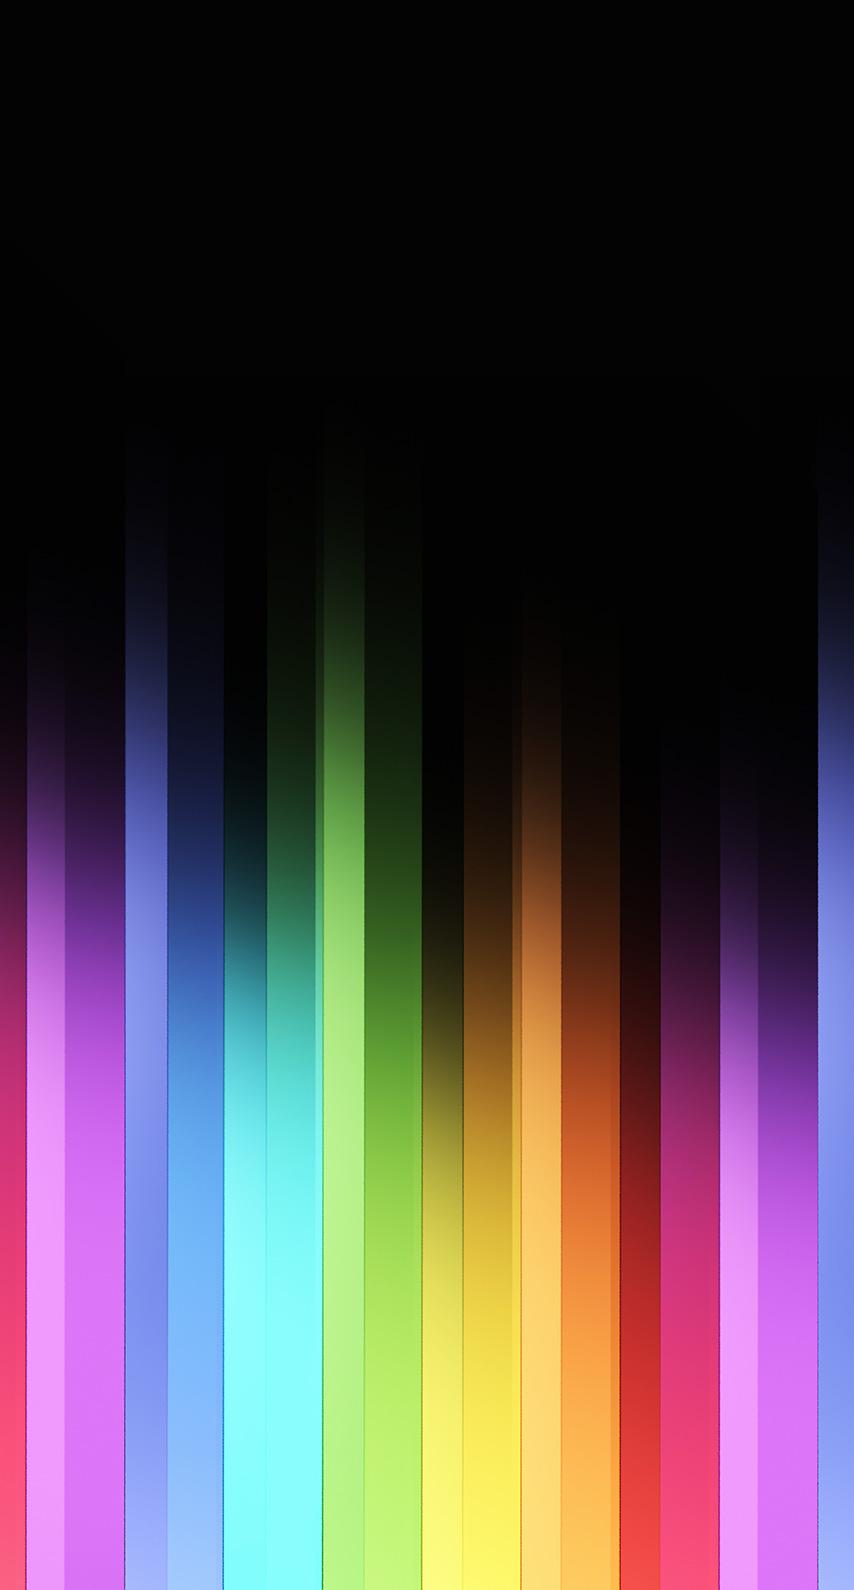 rainbow, bars